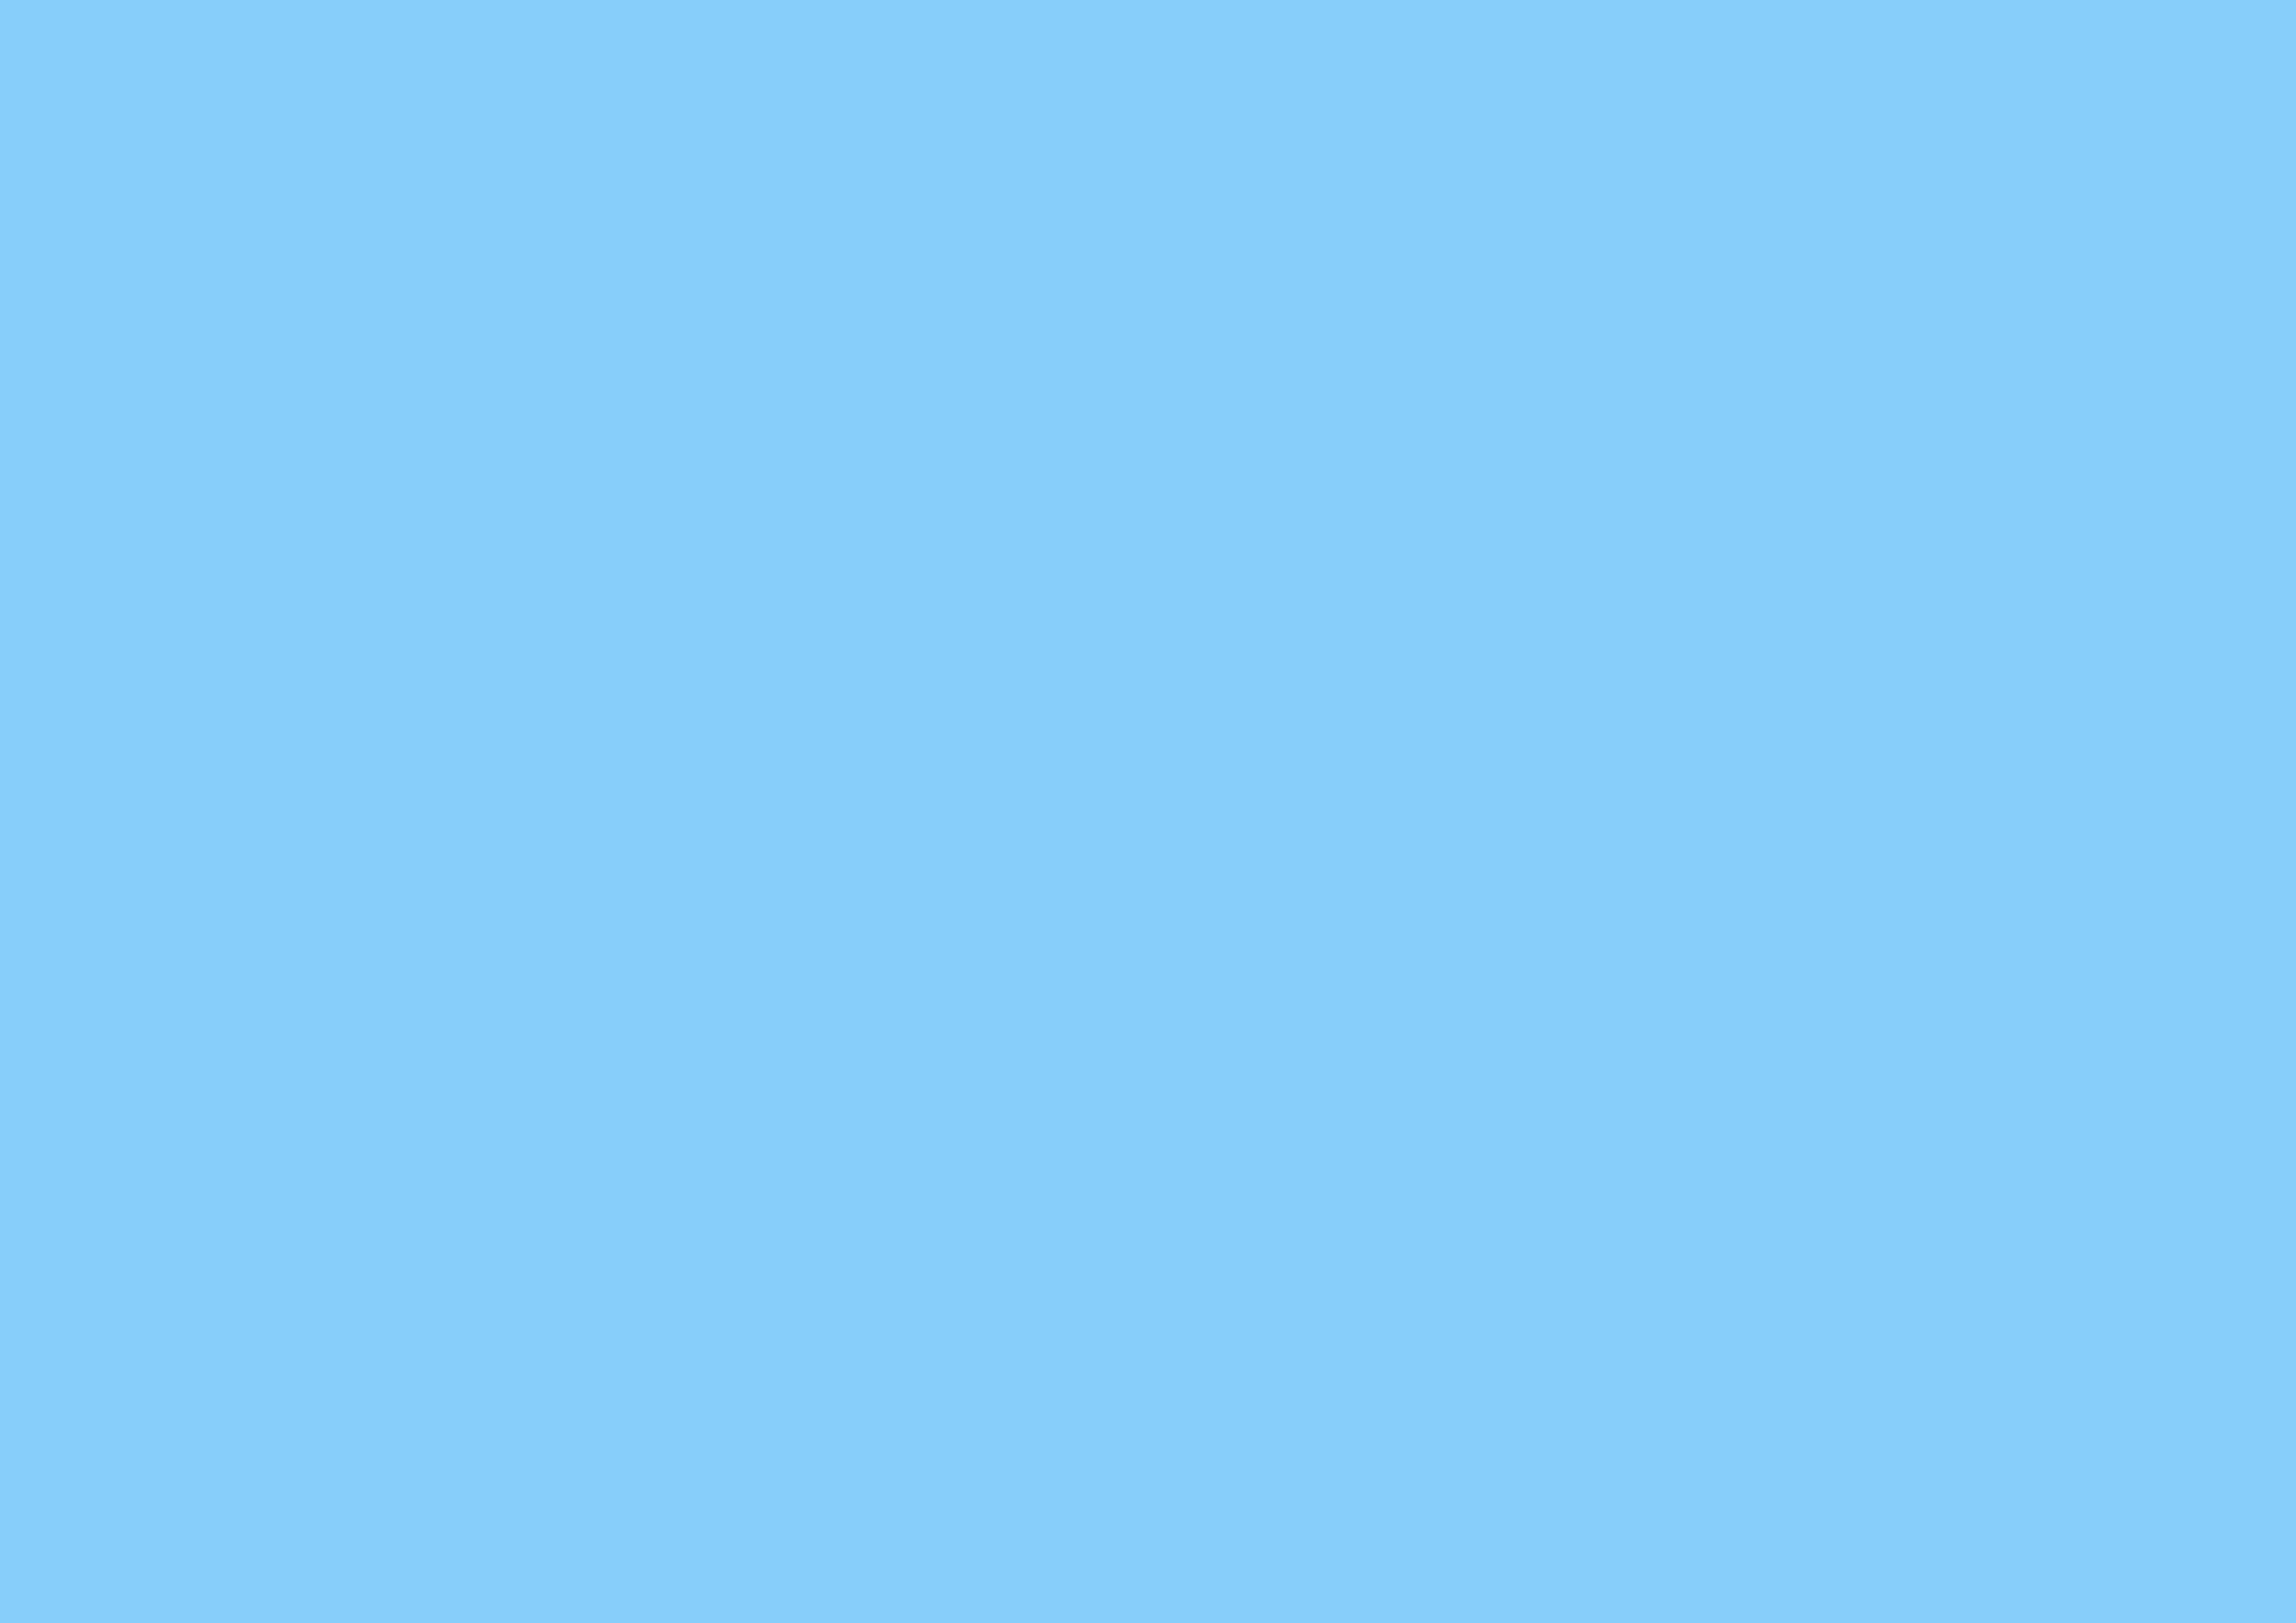 3508x2480 Light Sky Blue Solid Color Background